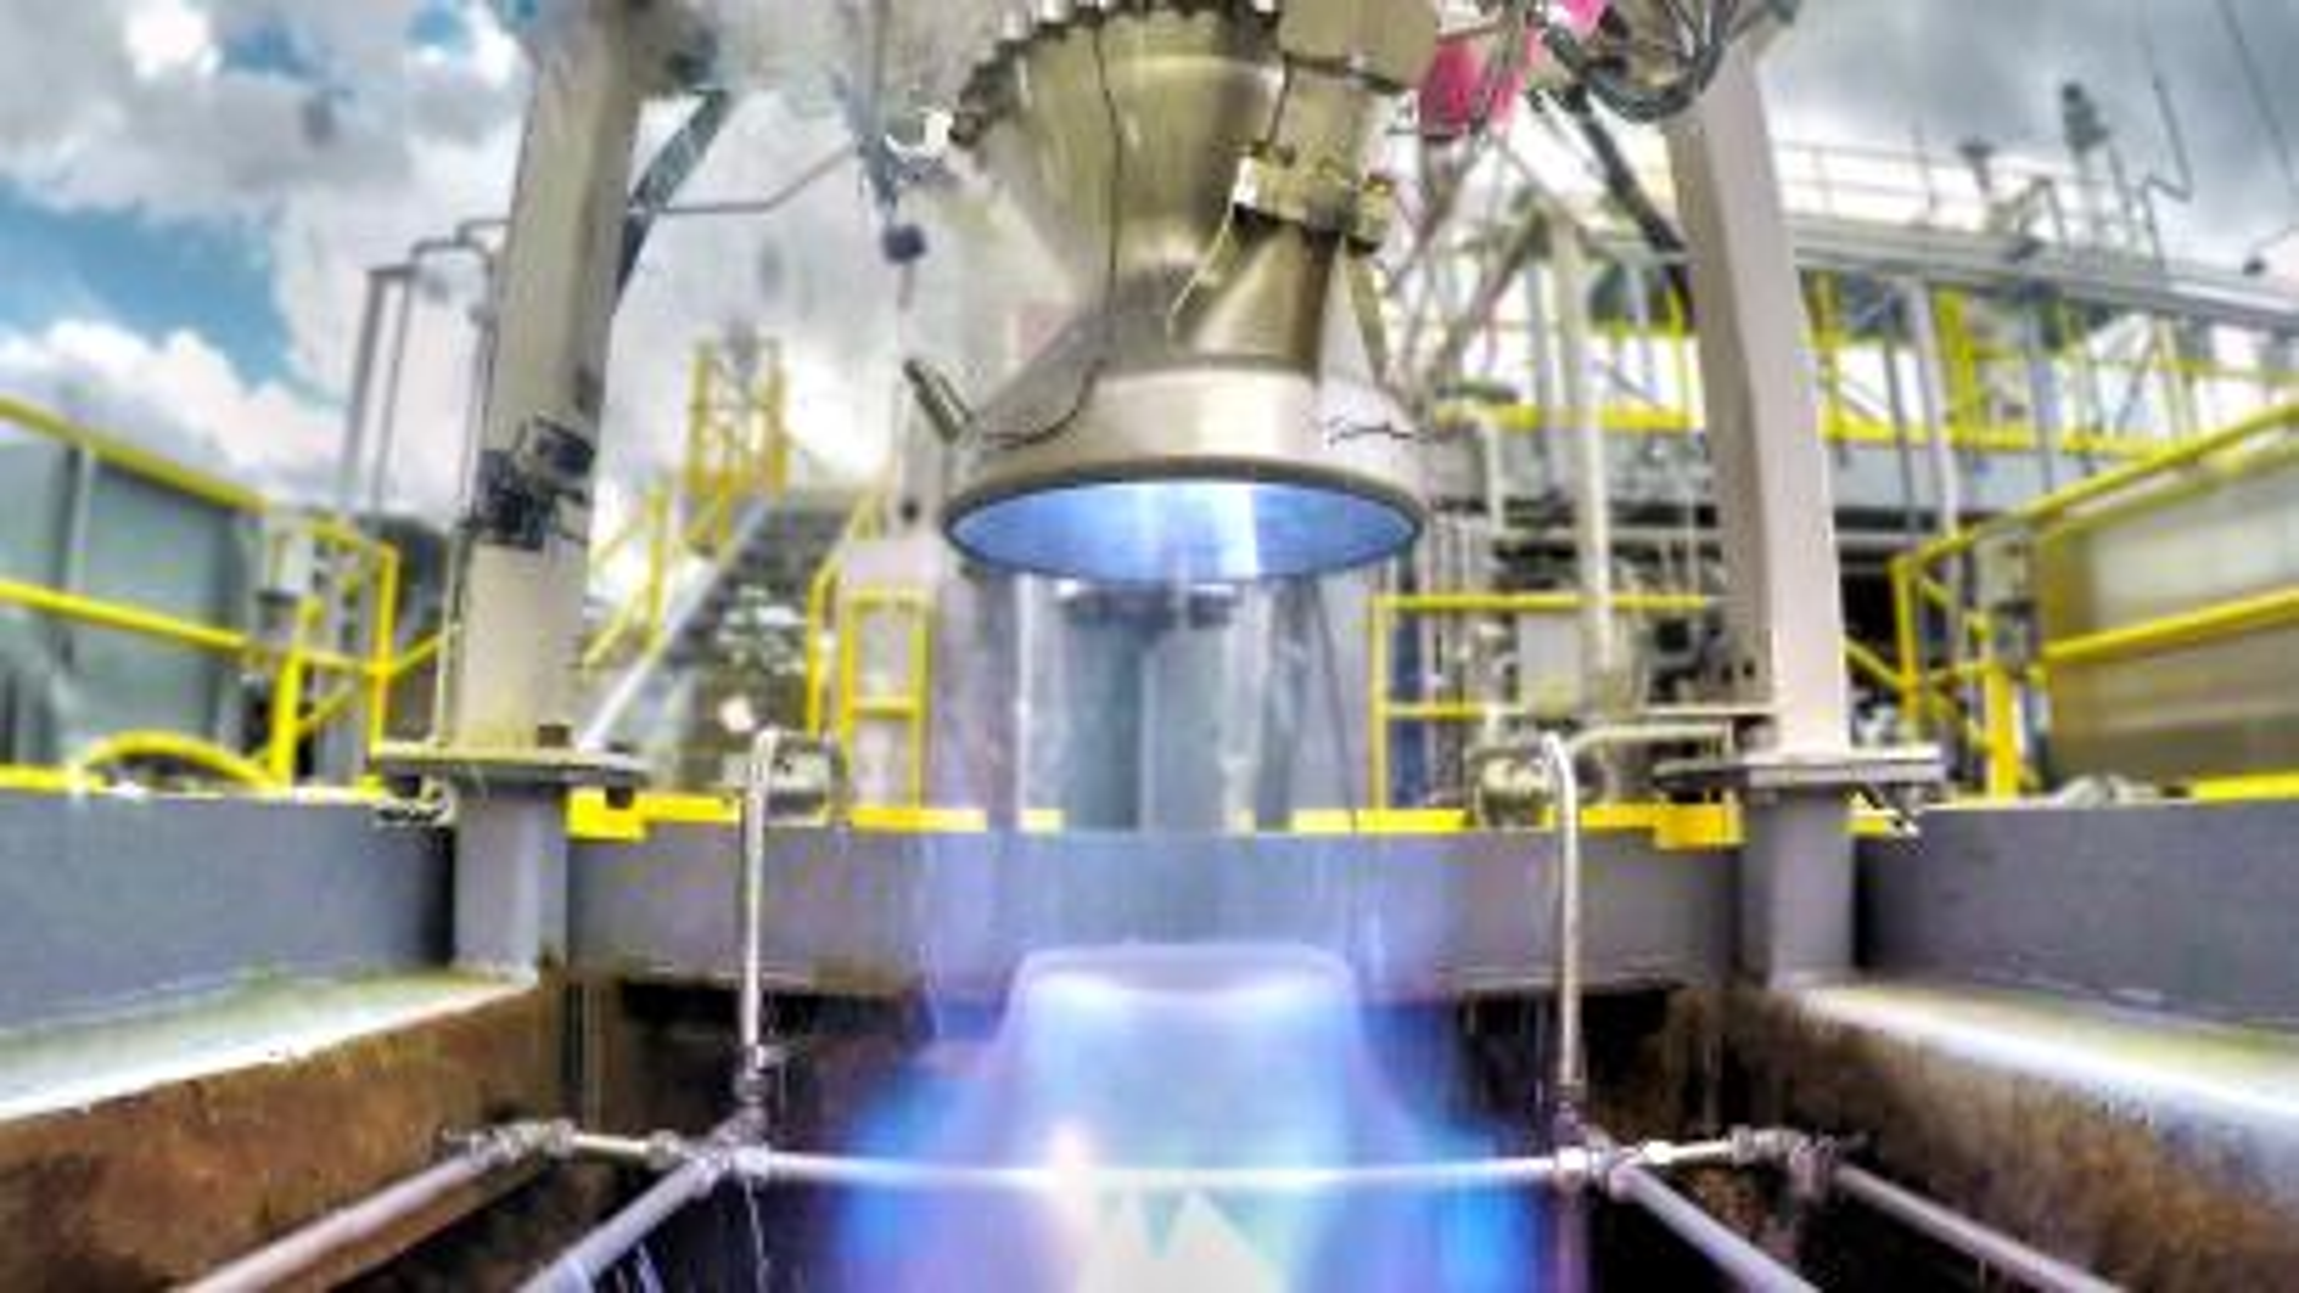 Relativity's engine at work.